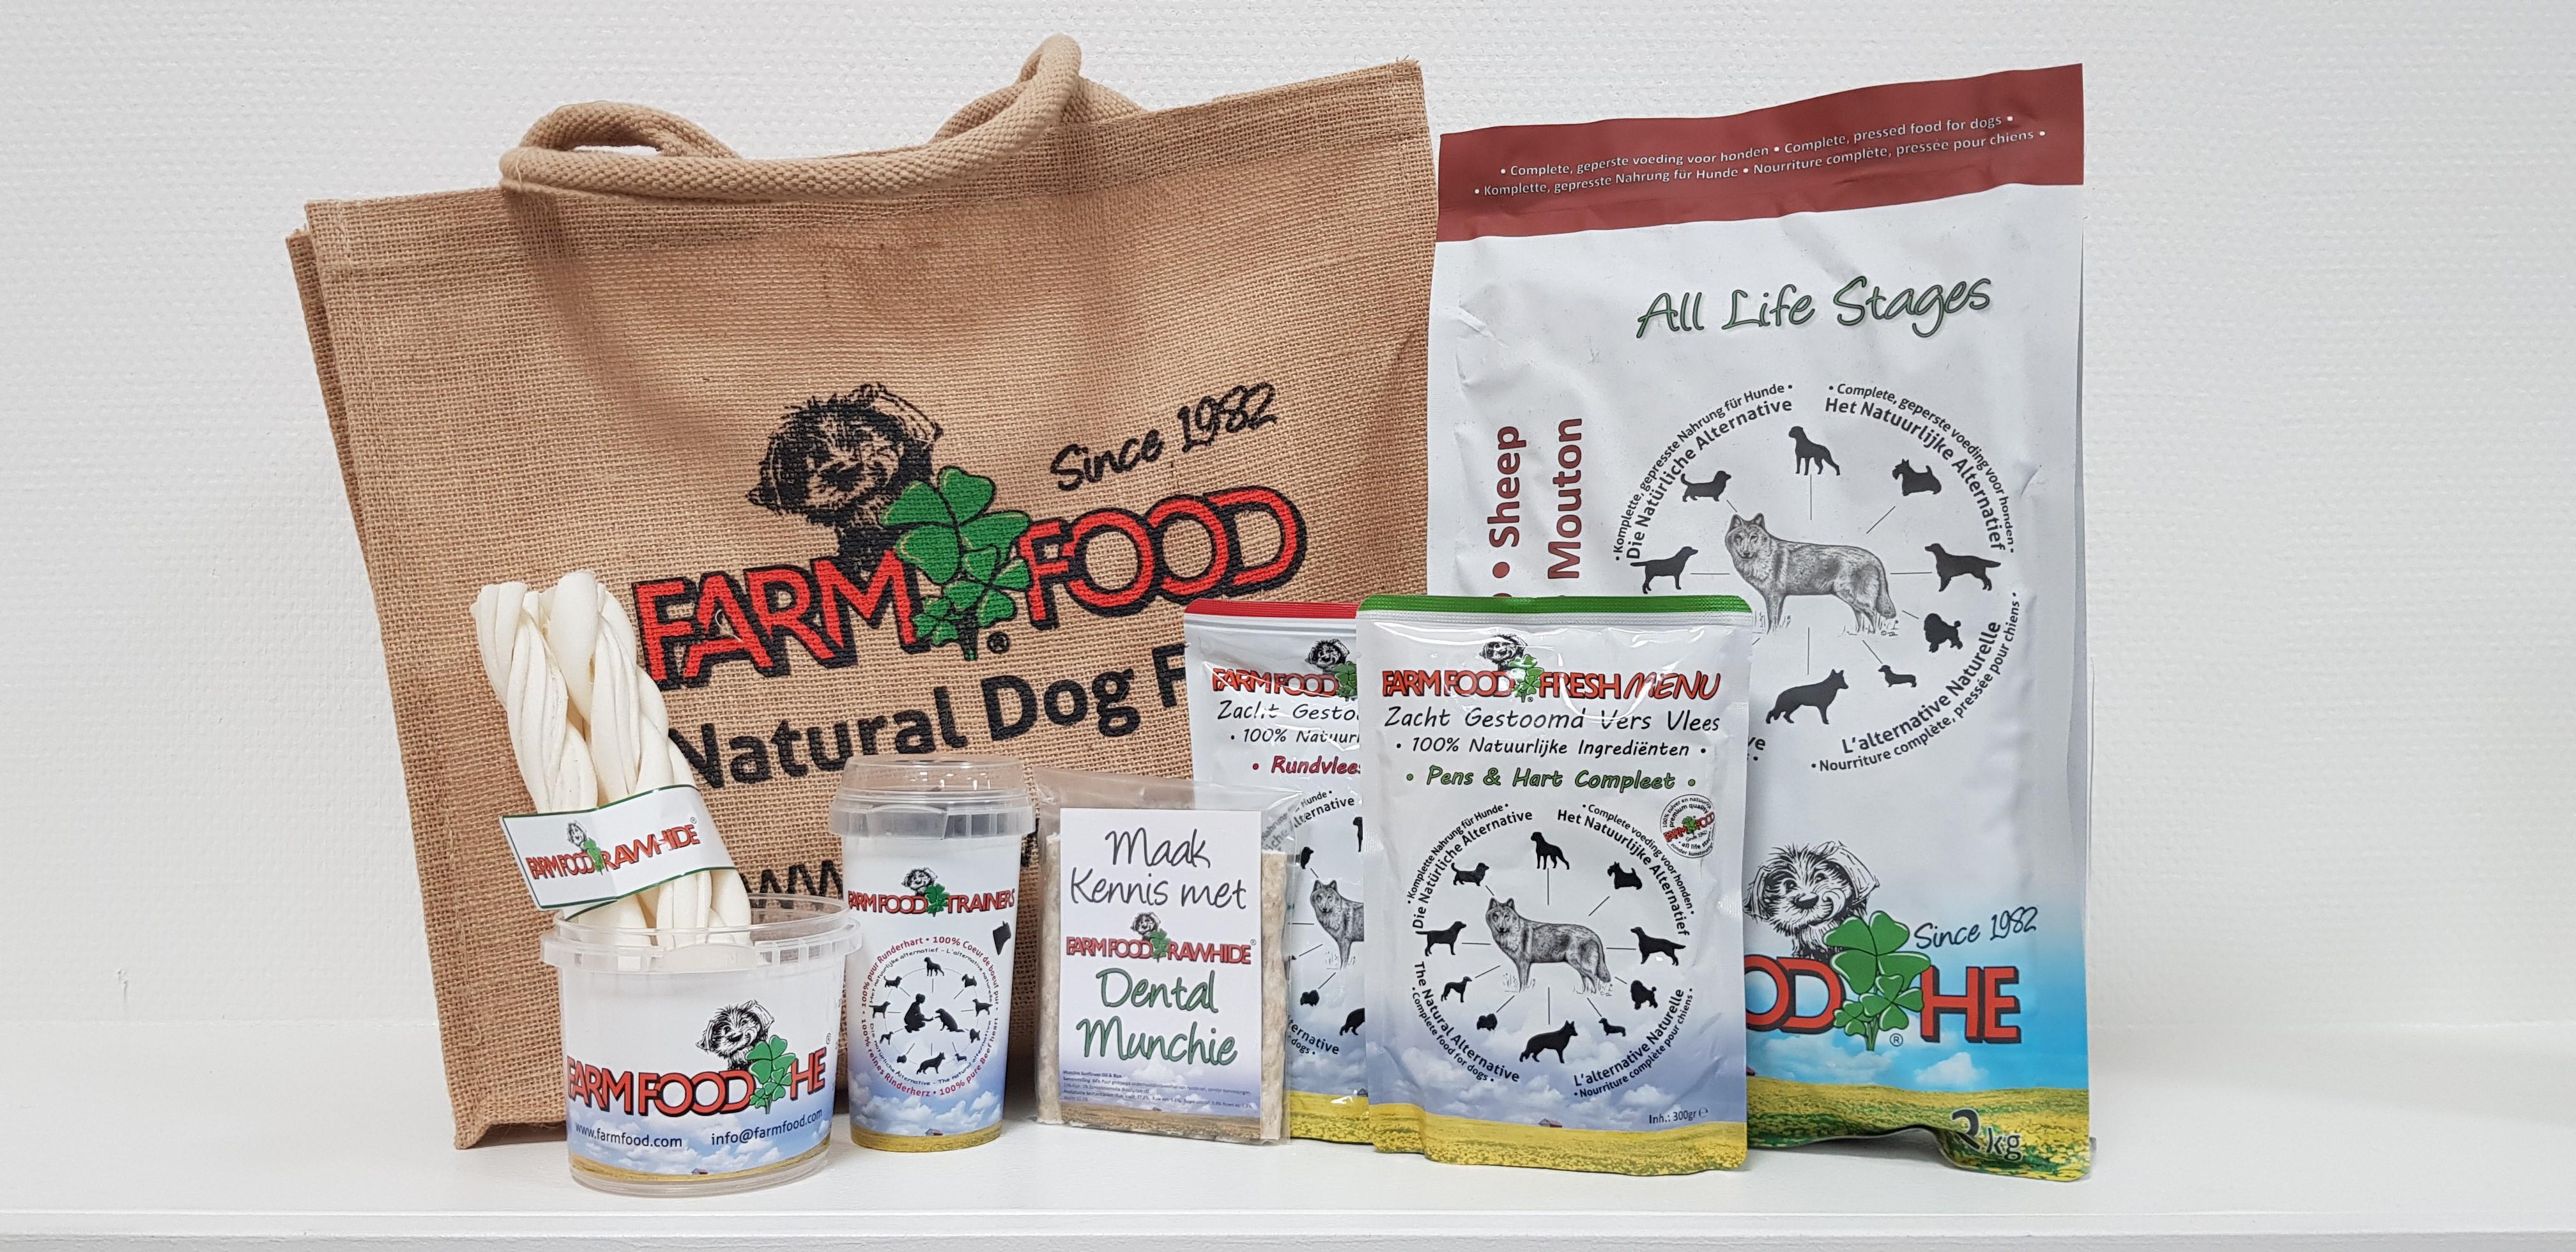 Farm Food voerpakket voor je hond - Animal Event 2020